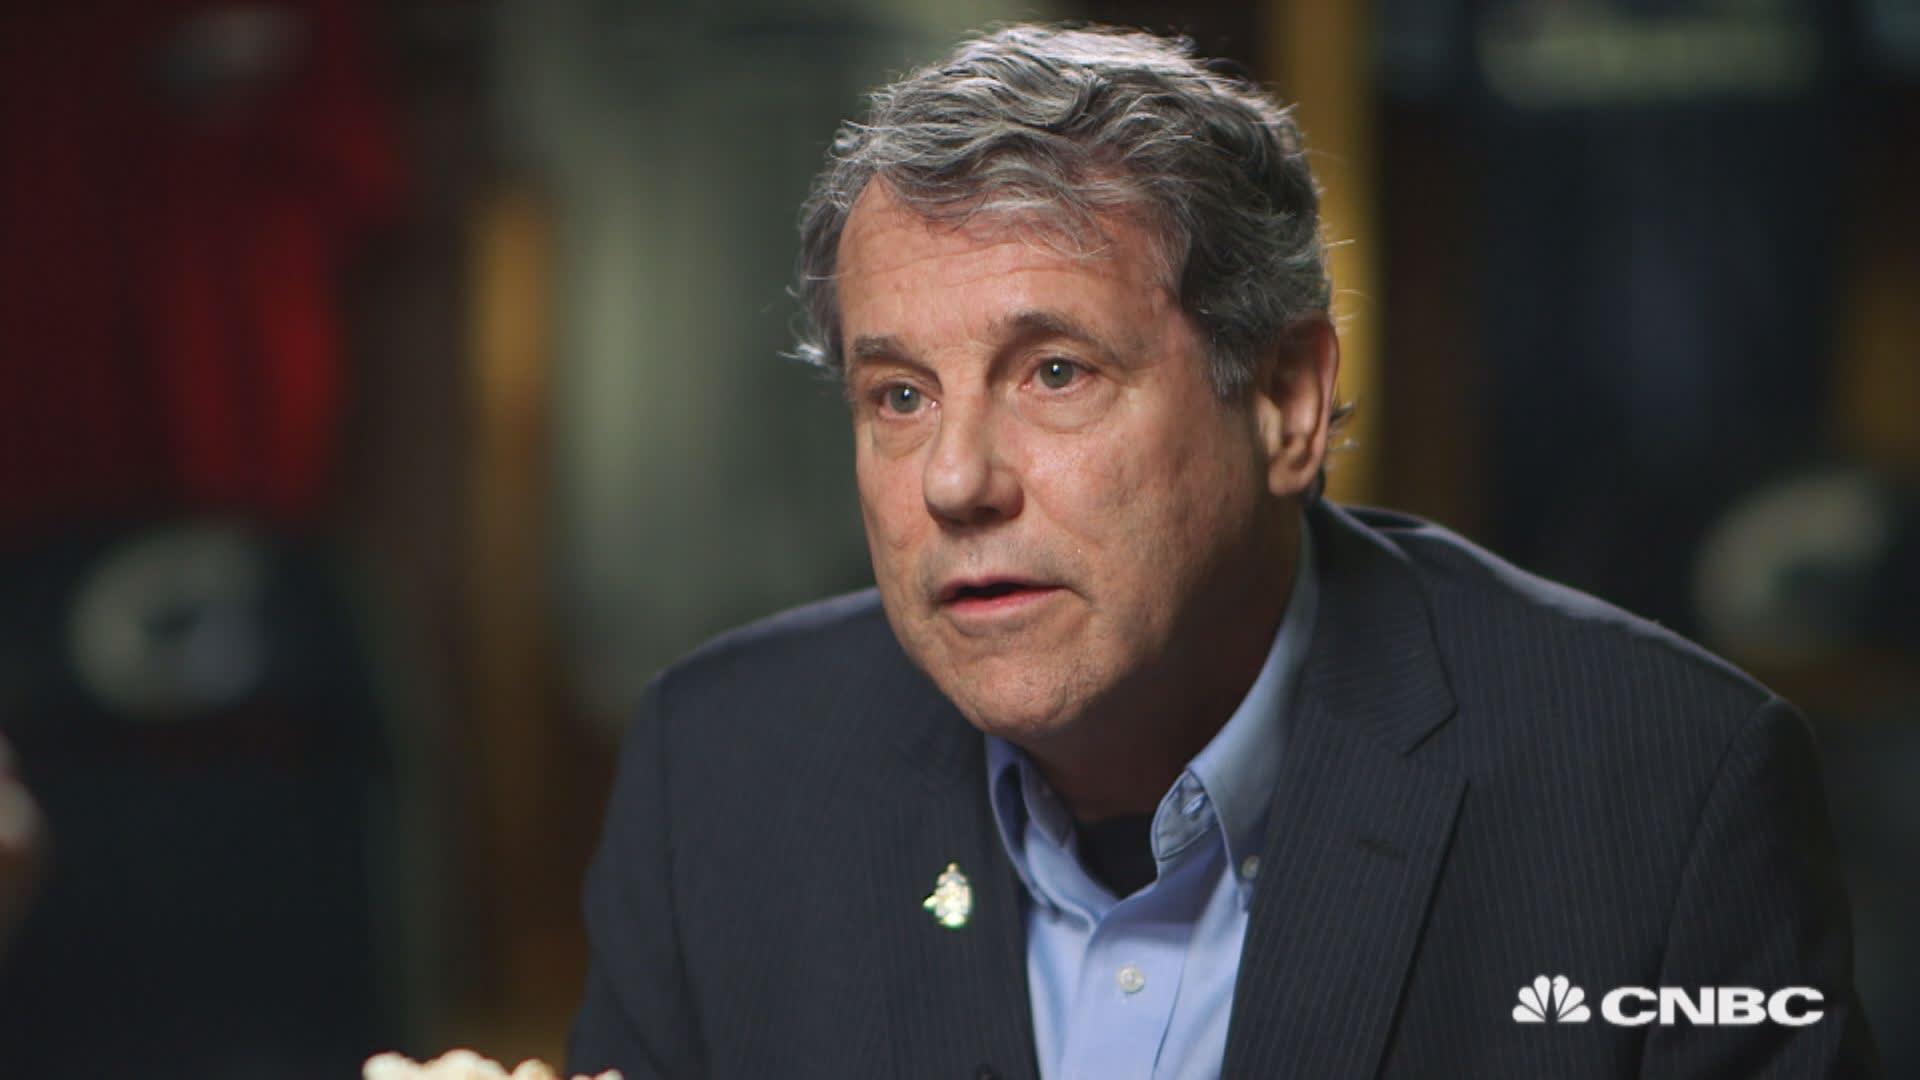 Top Democratic Sen. Sherrod Brown says Trump isn't doing enough to cut drug prices